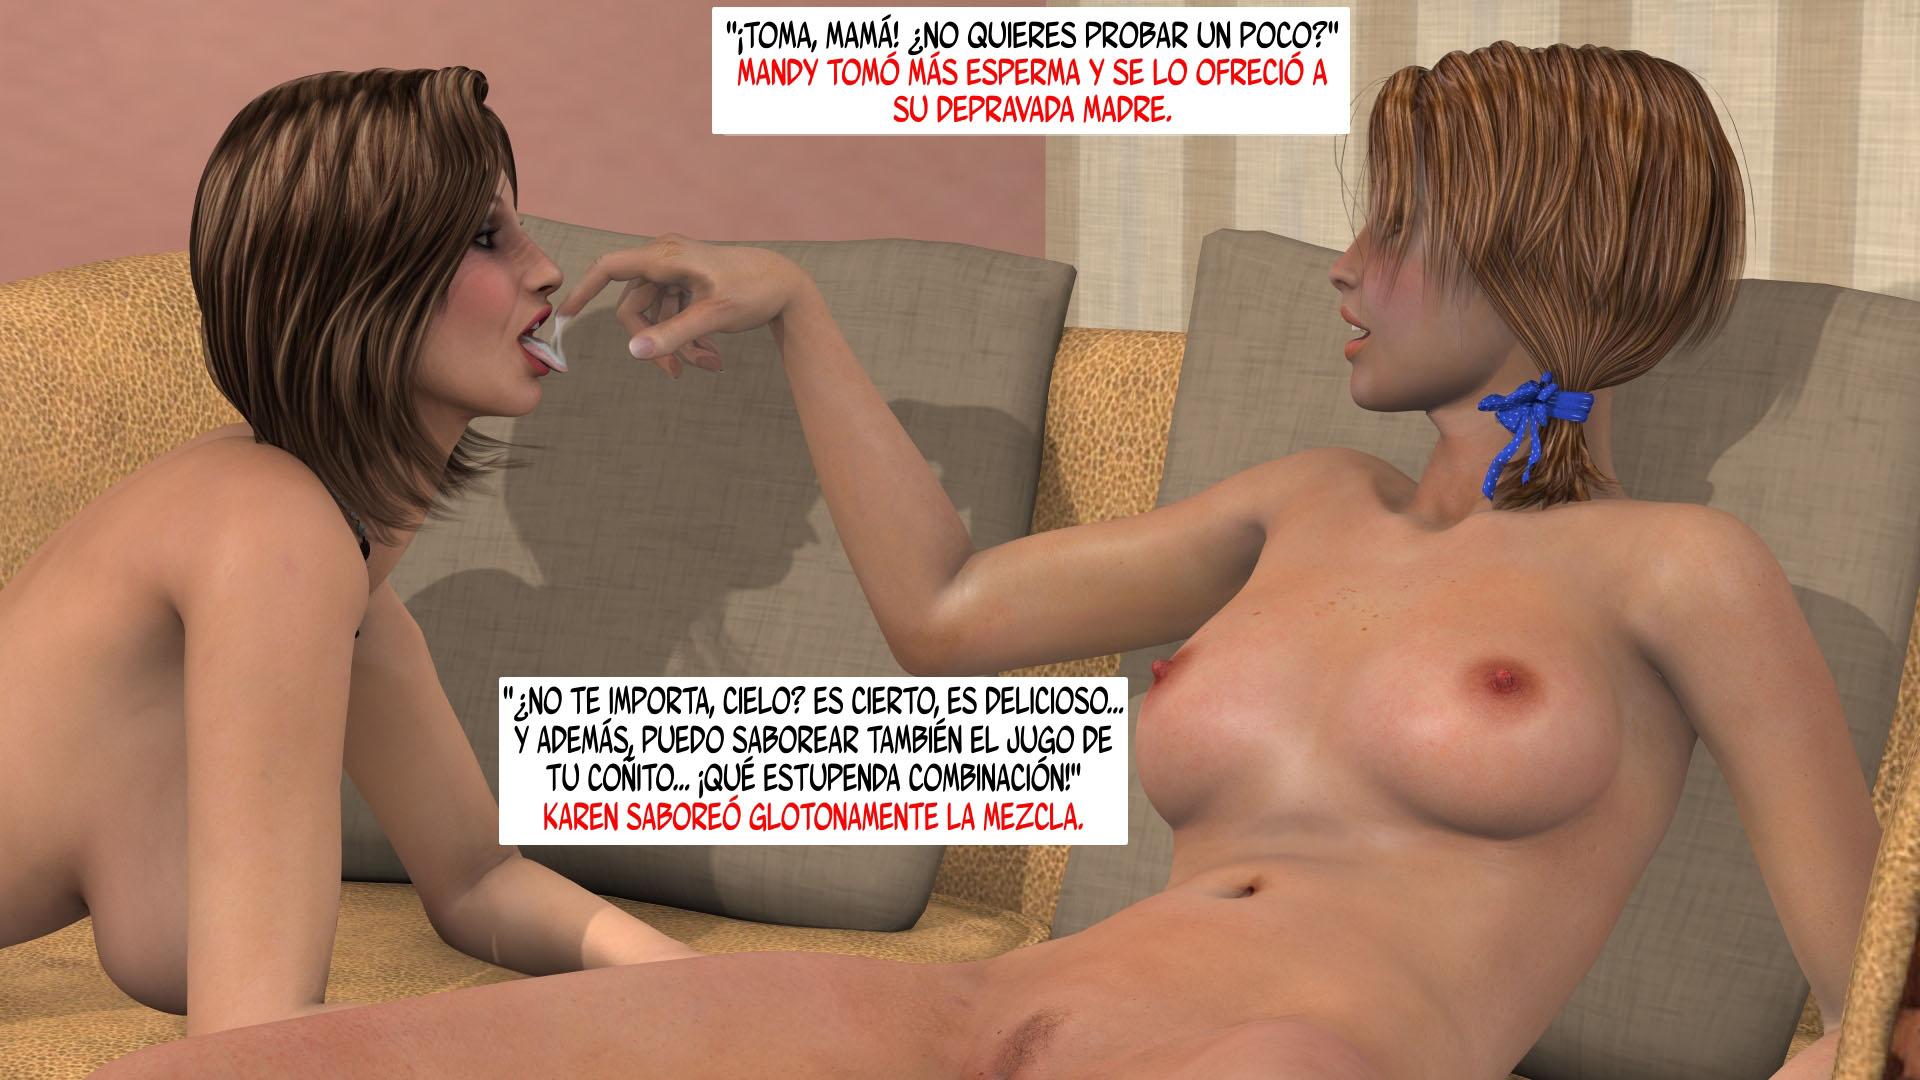 A Madre Porno de tal madre tal hija incesto 3d español ~ ver porno comics